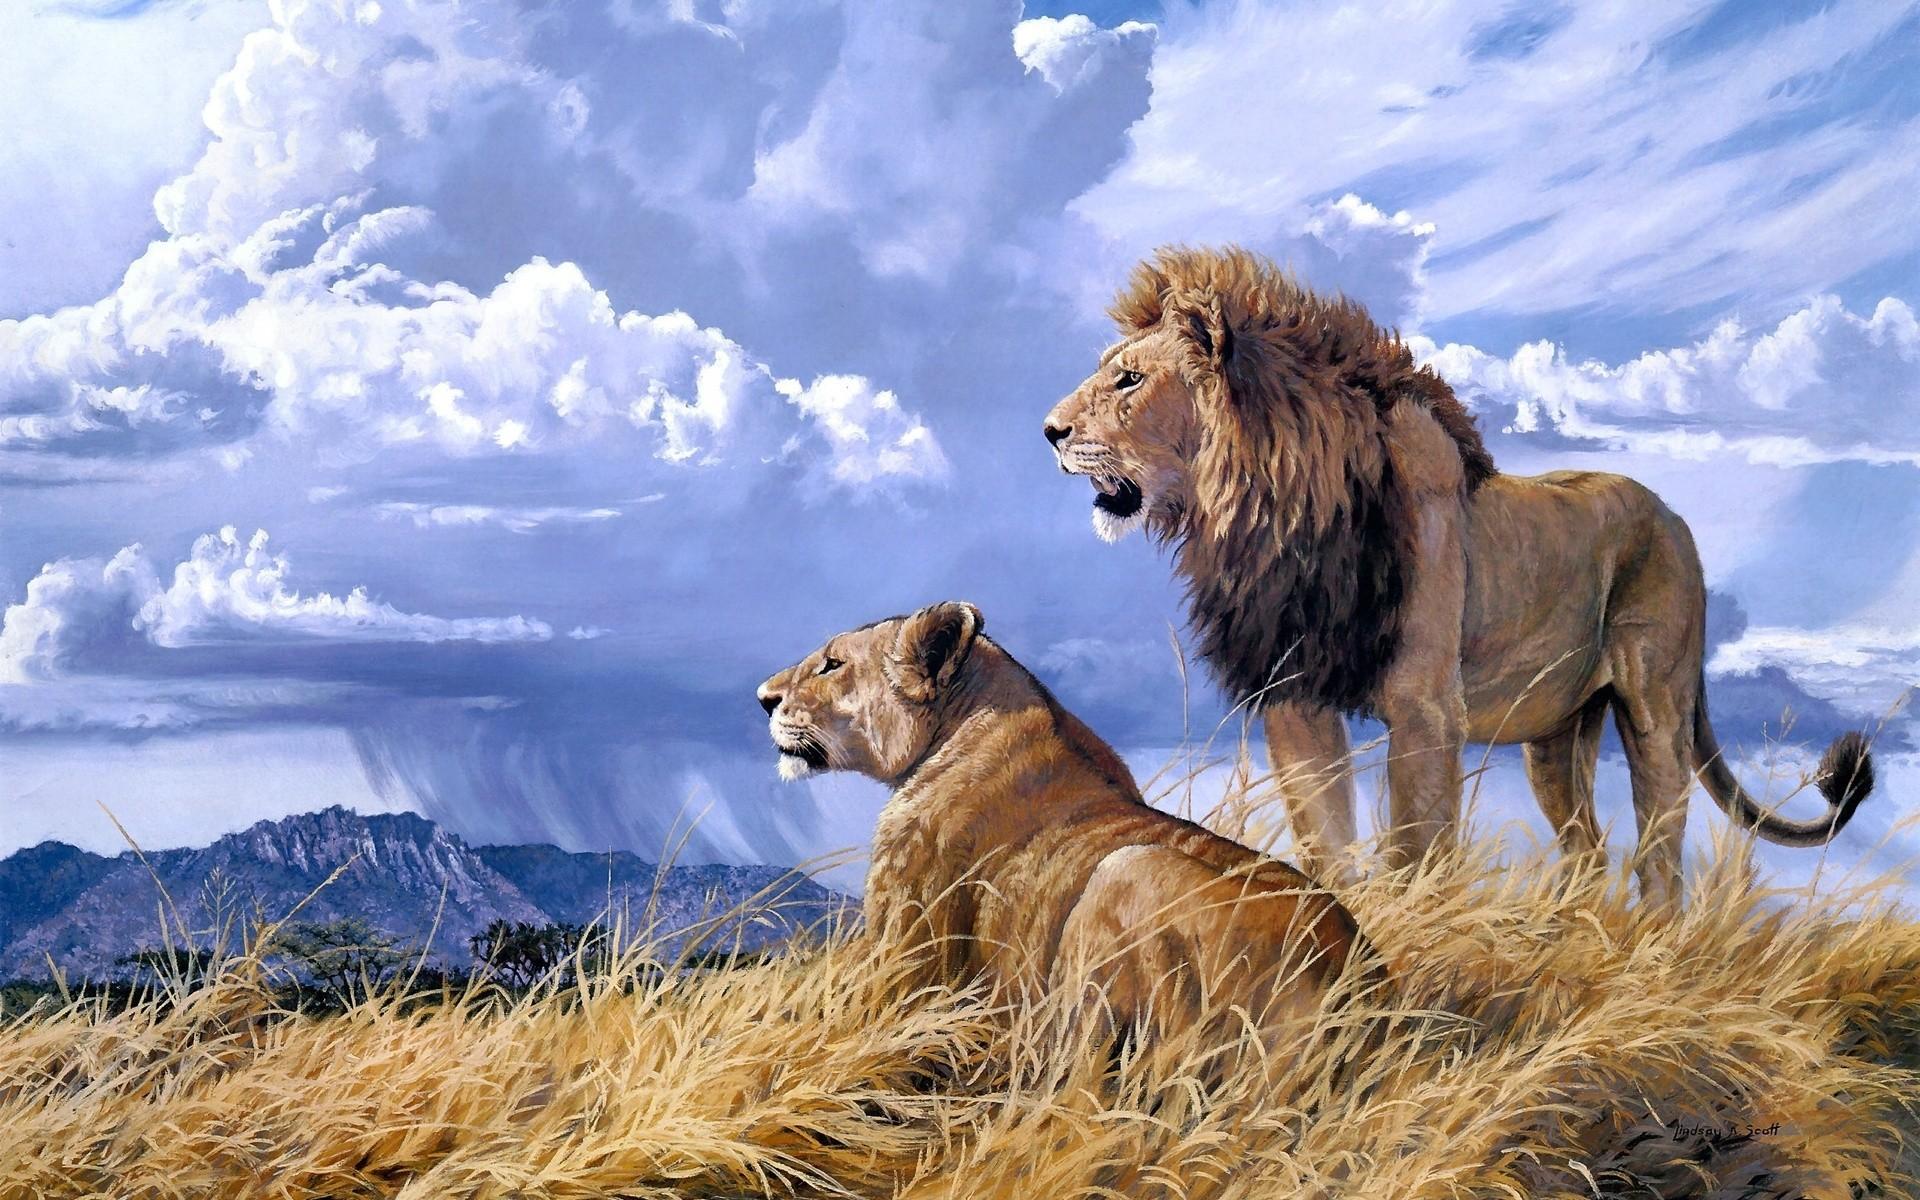 animals cats lion painting art landscape nature wildlife africa grass .